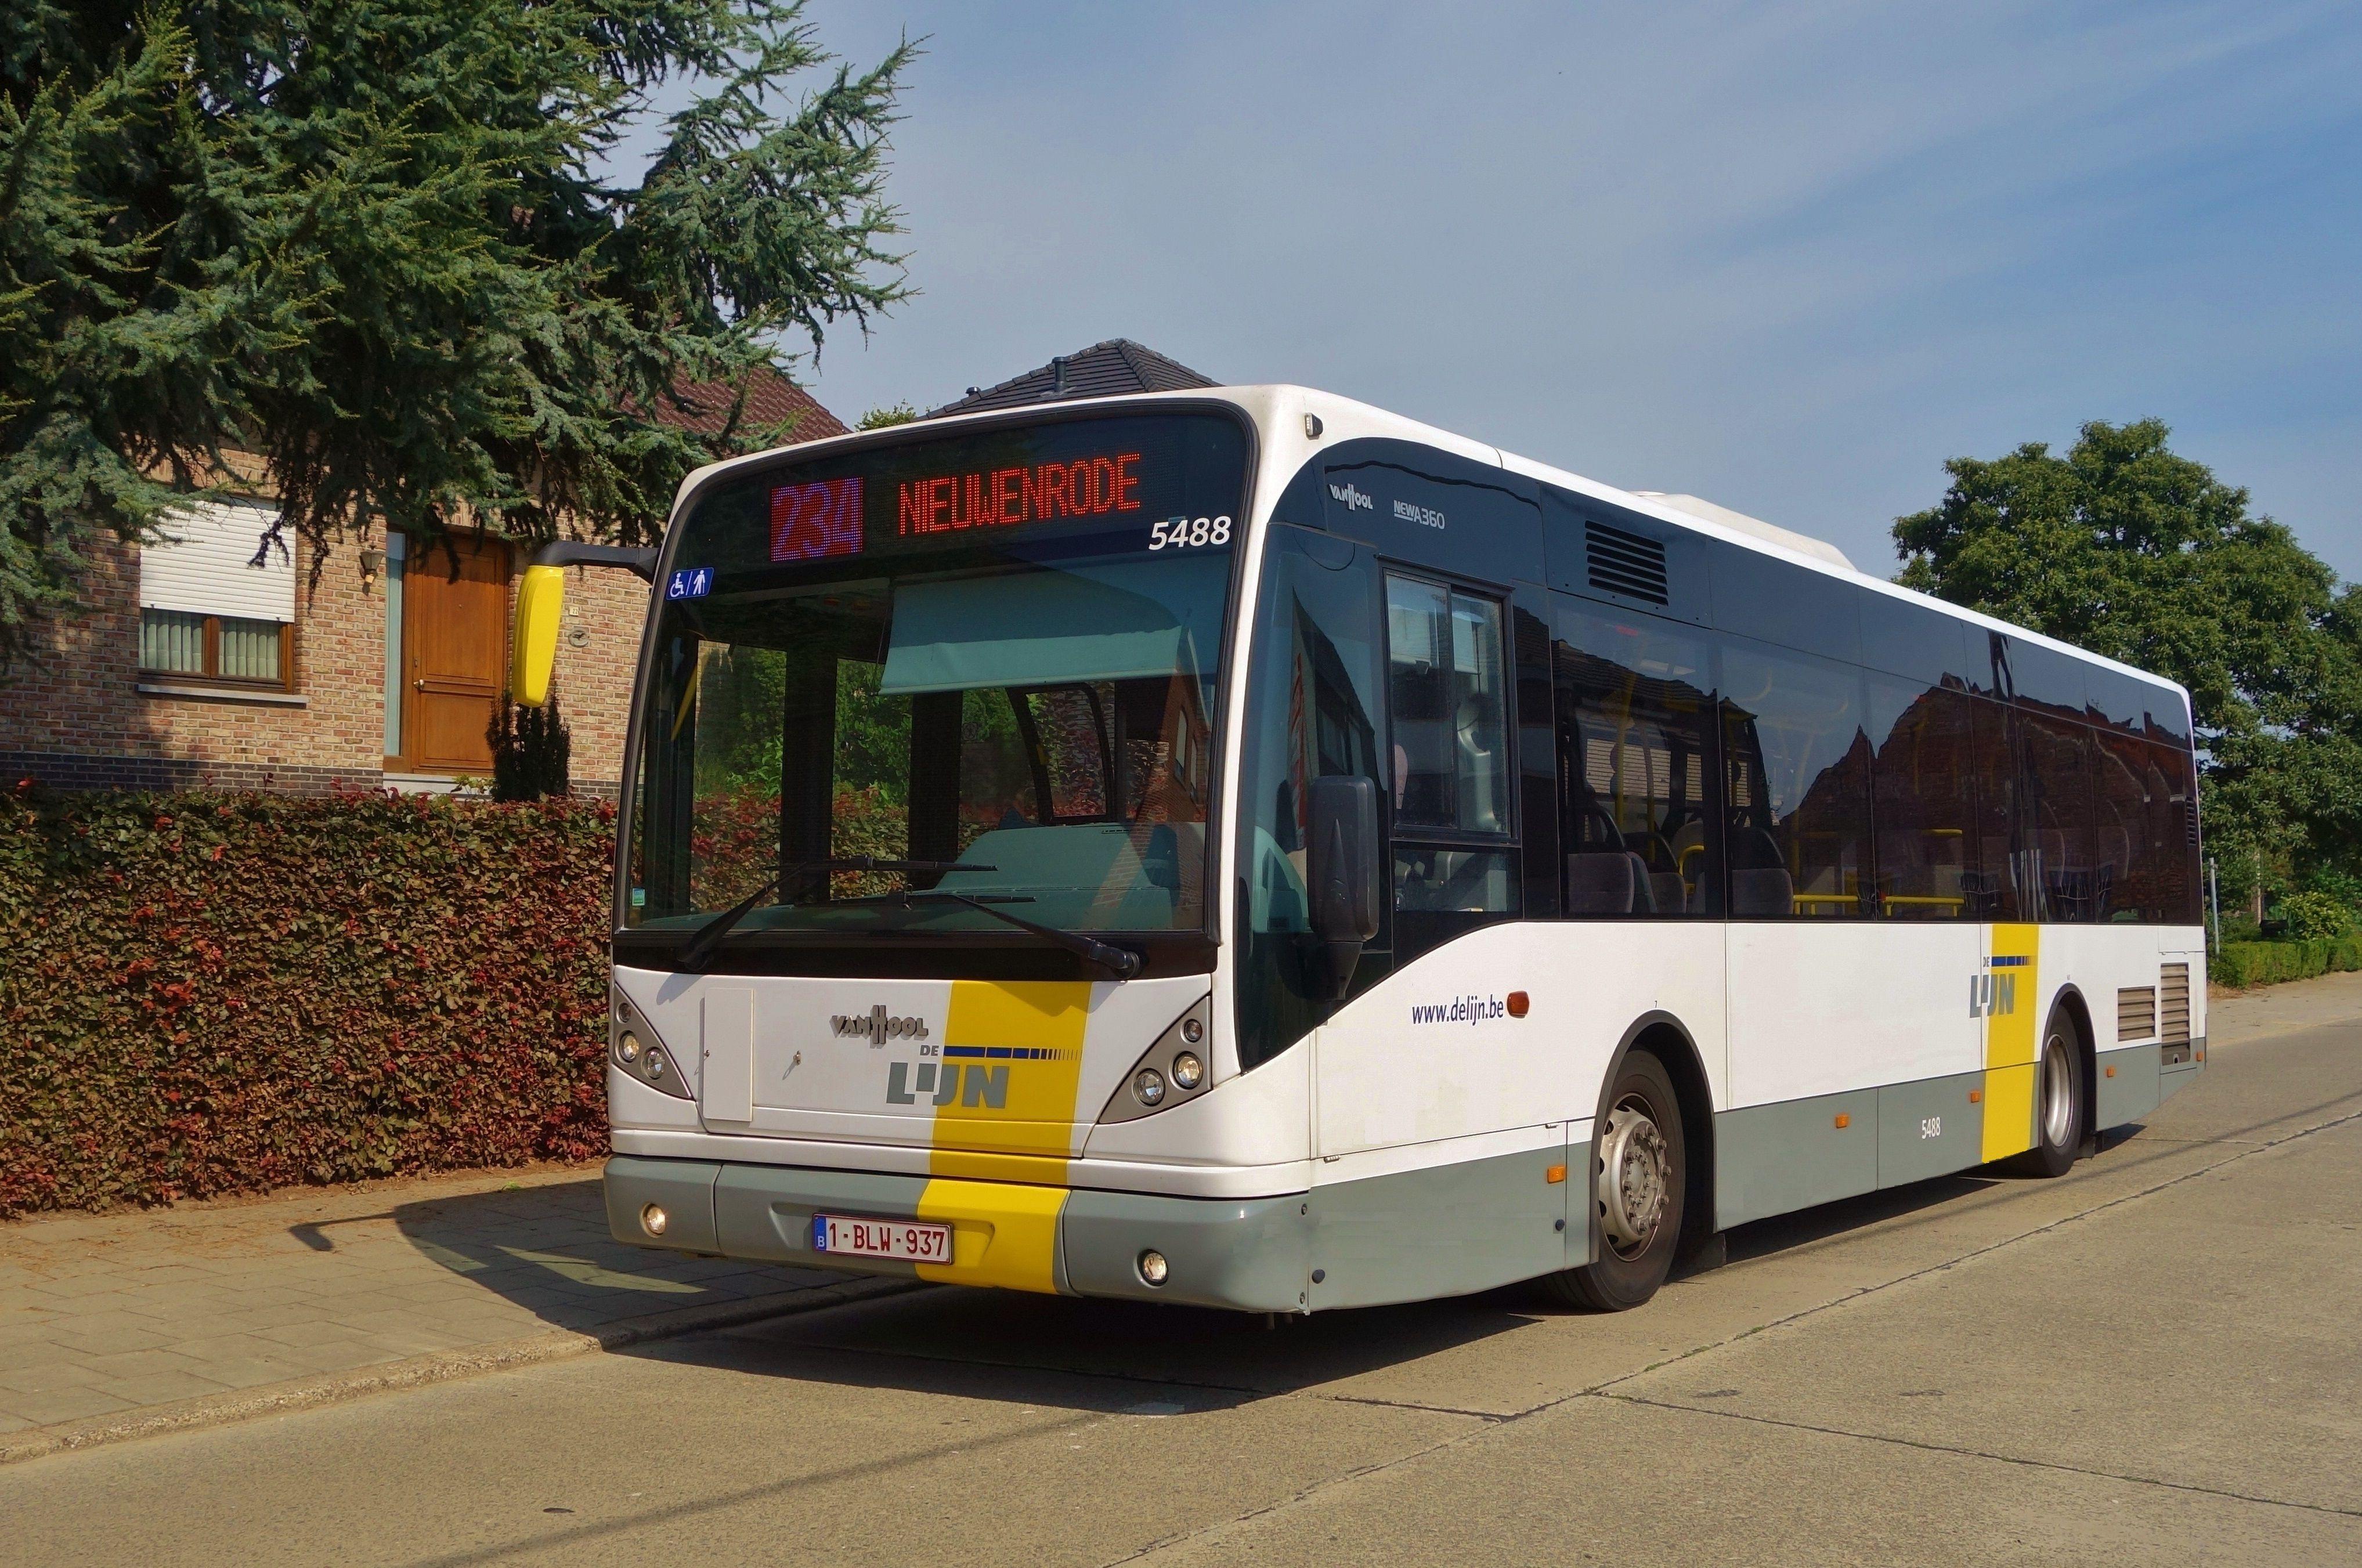 AB 5488 In Nieuwenrode Vlaams Brabant